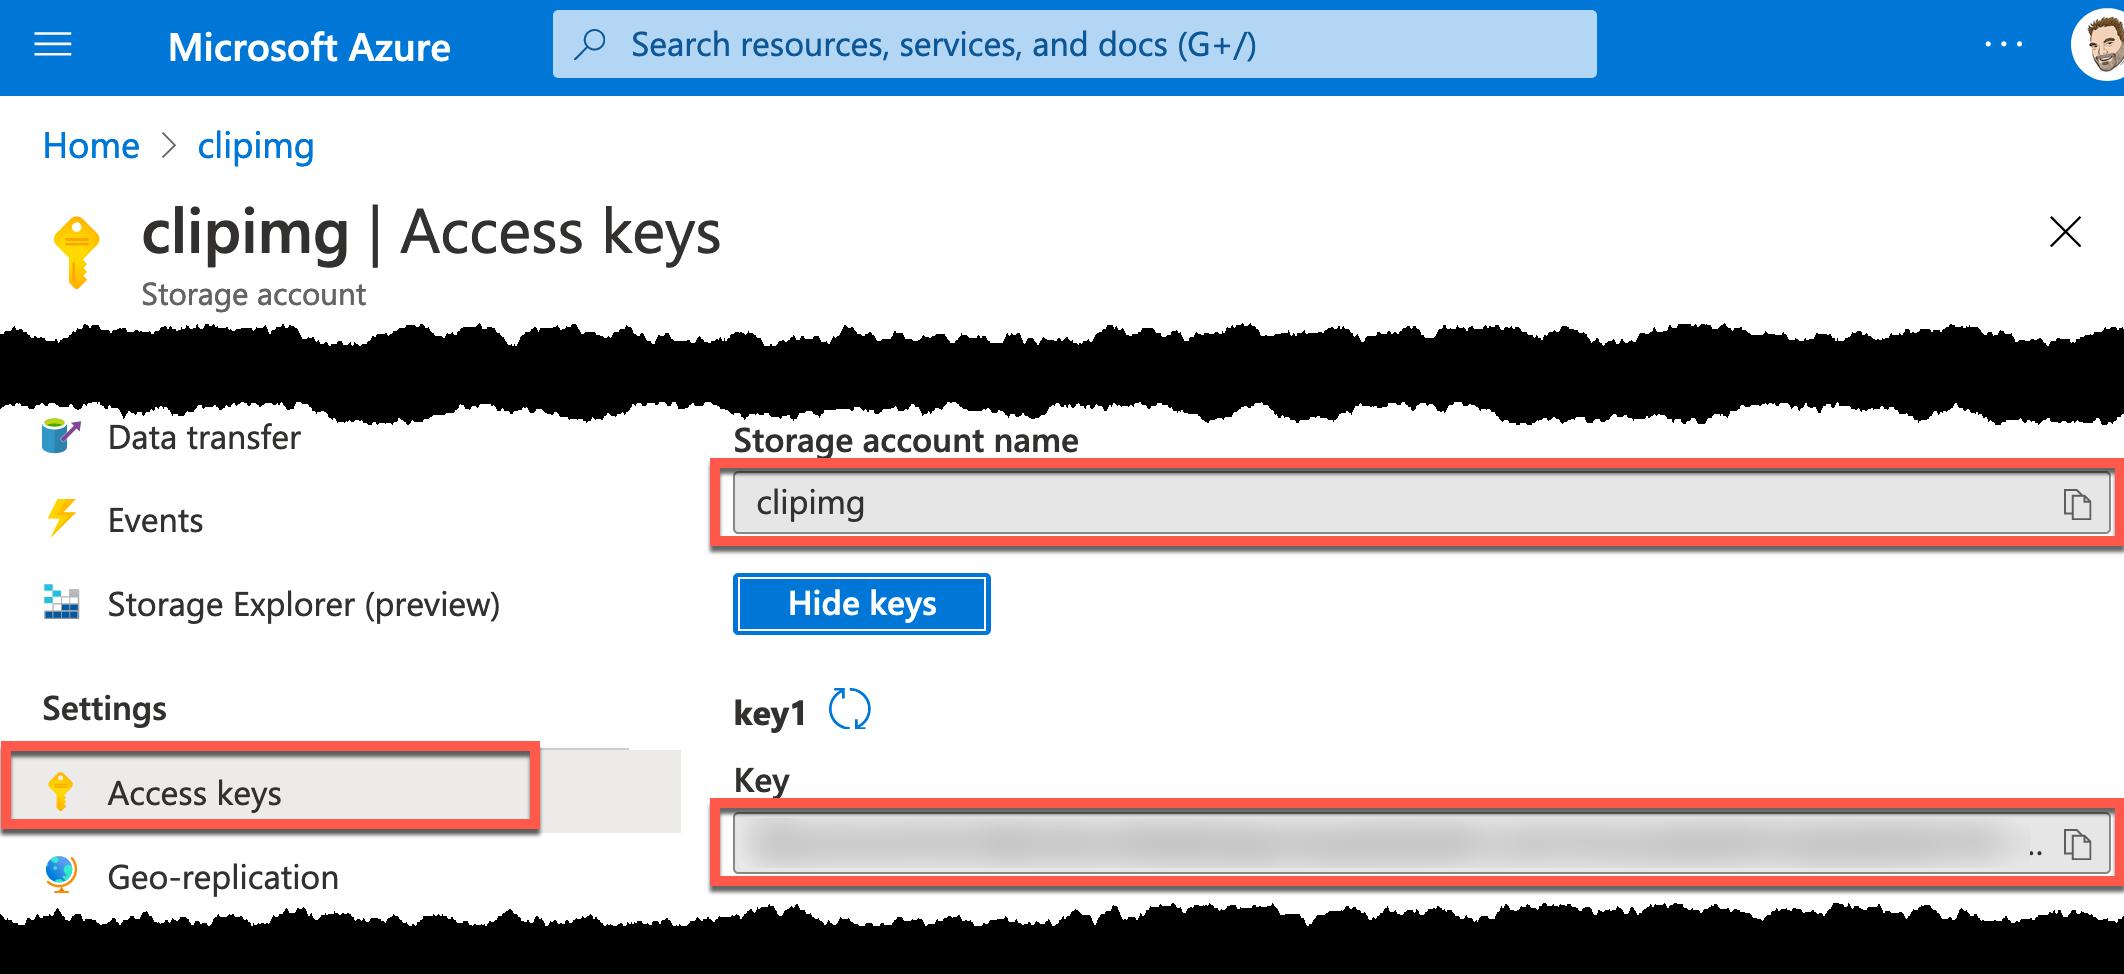 Azure portal storage account name and key